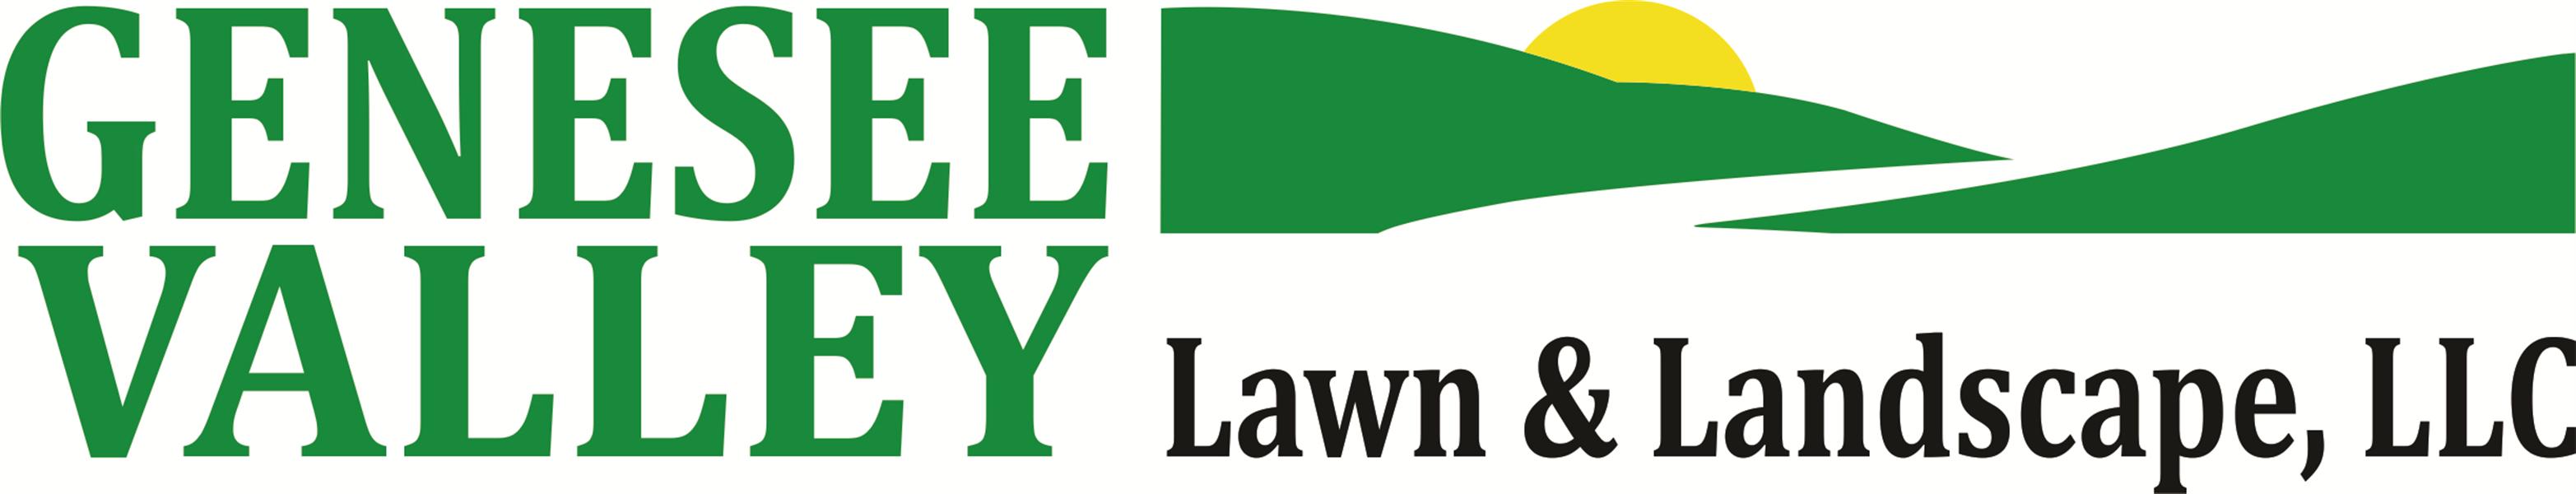 Genesee Valley Lawn & Landscape, LLC.